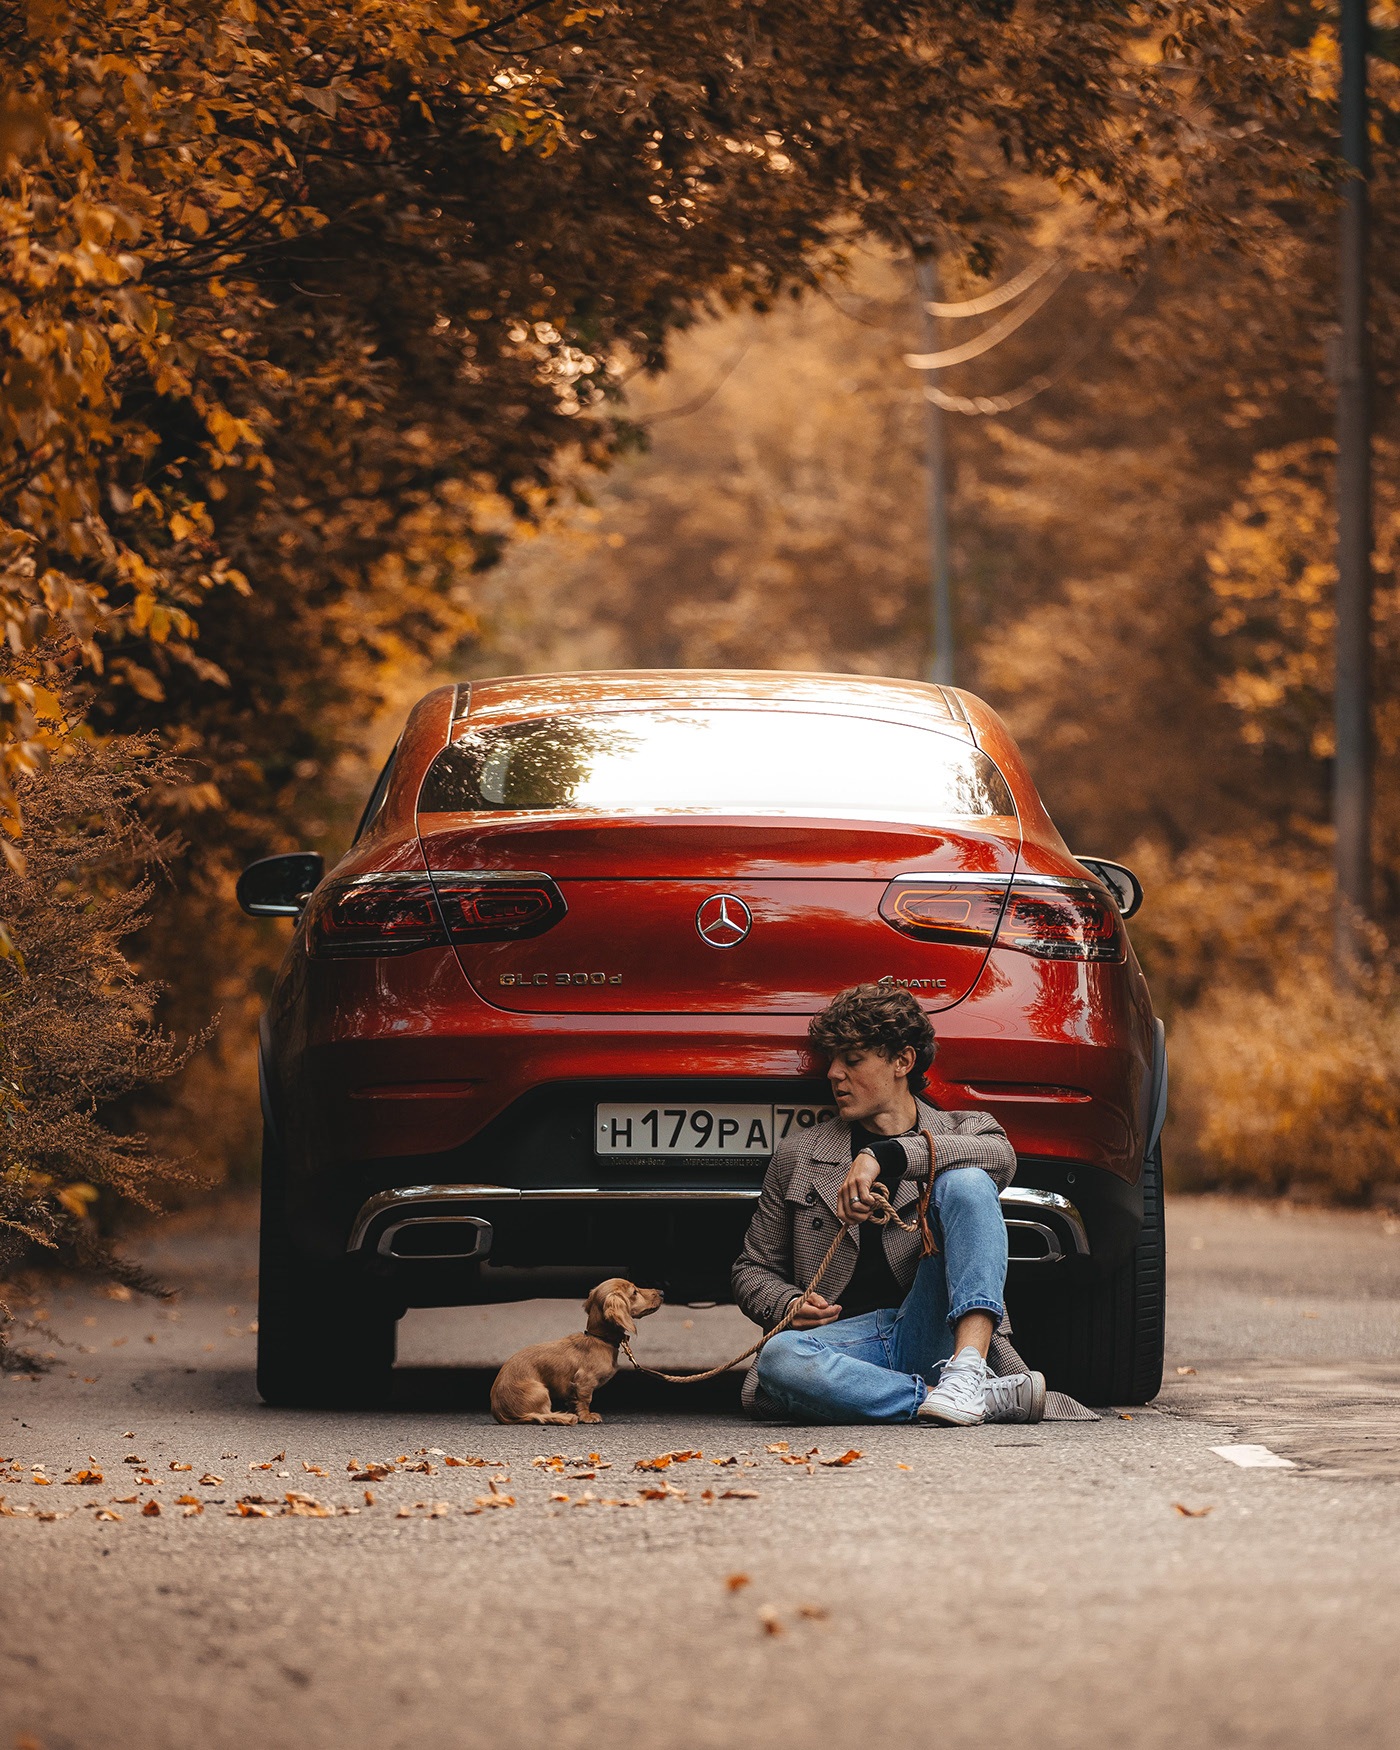 Mercedes-Benz GLC Coupe 300d / фотограф Alex Lygin